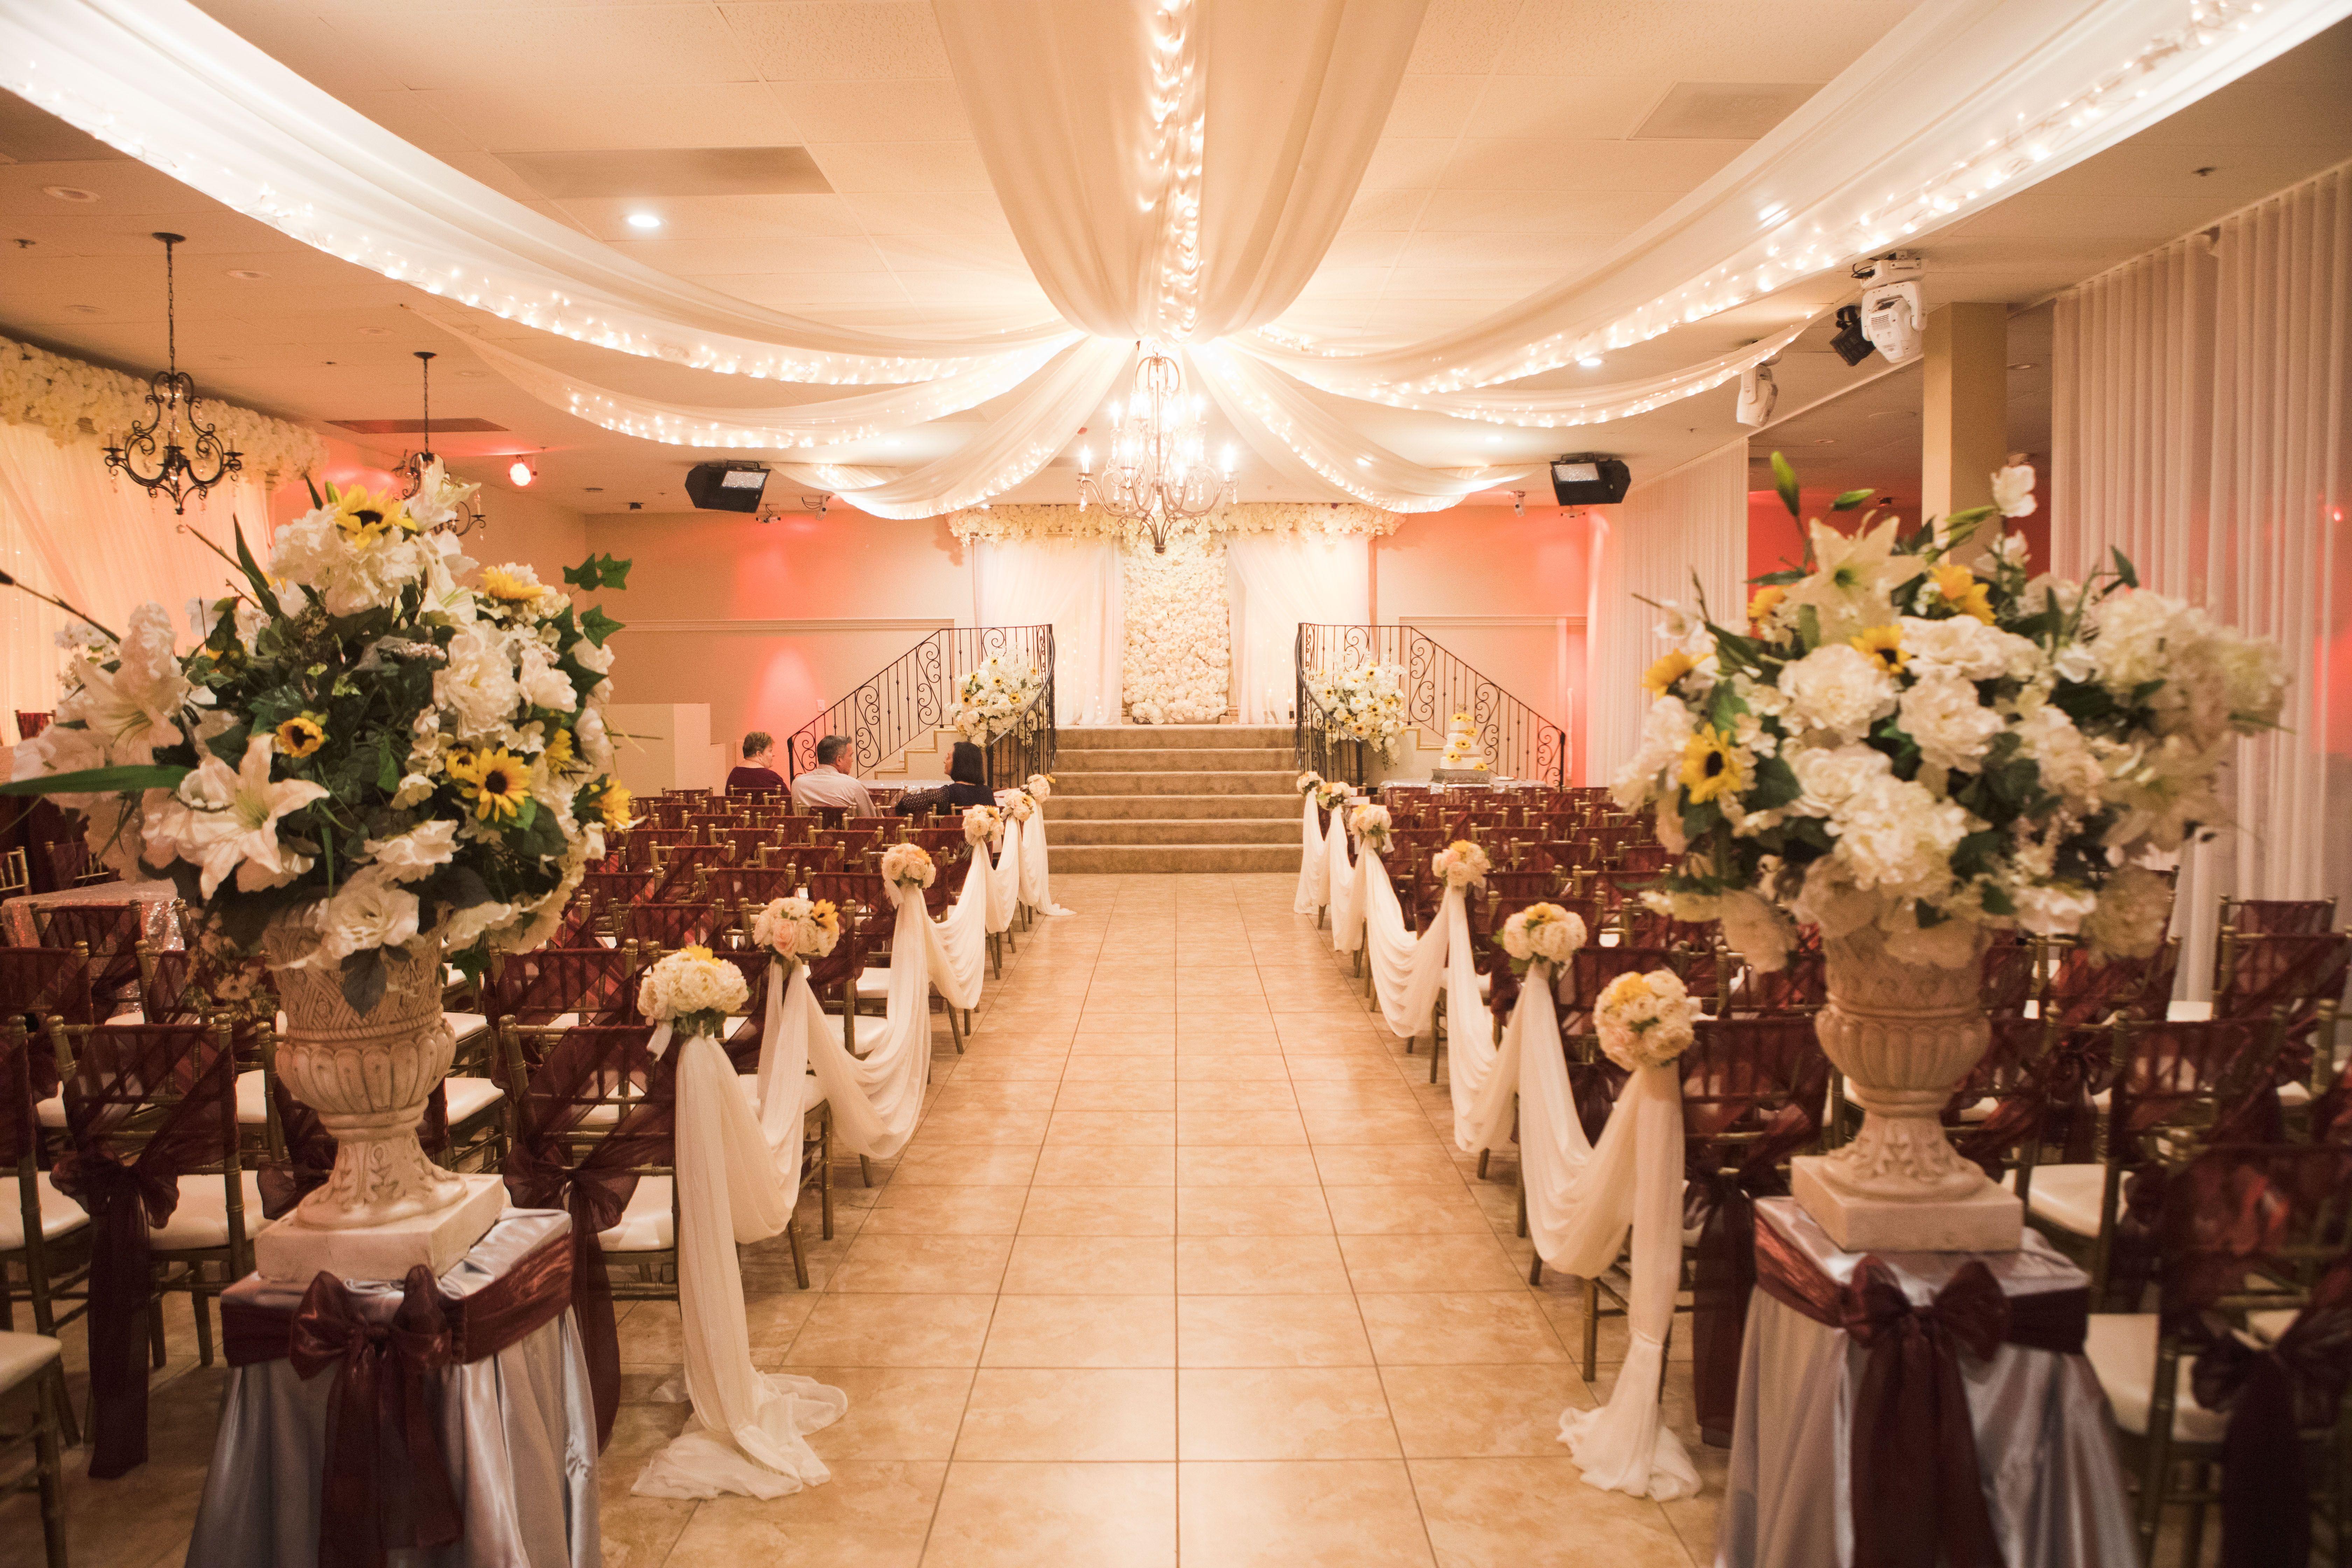 Indoor Wedding Ceremony With Maroon And Silver Colors Arizona